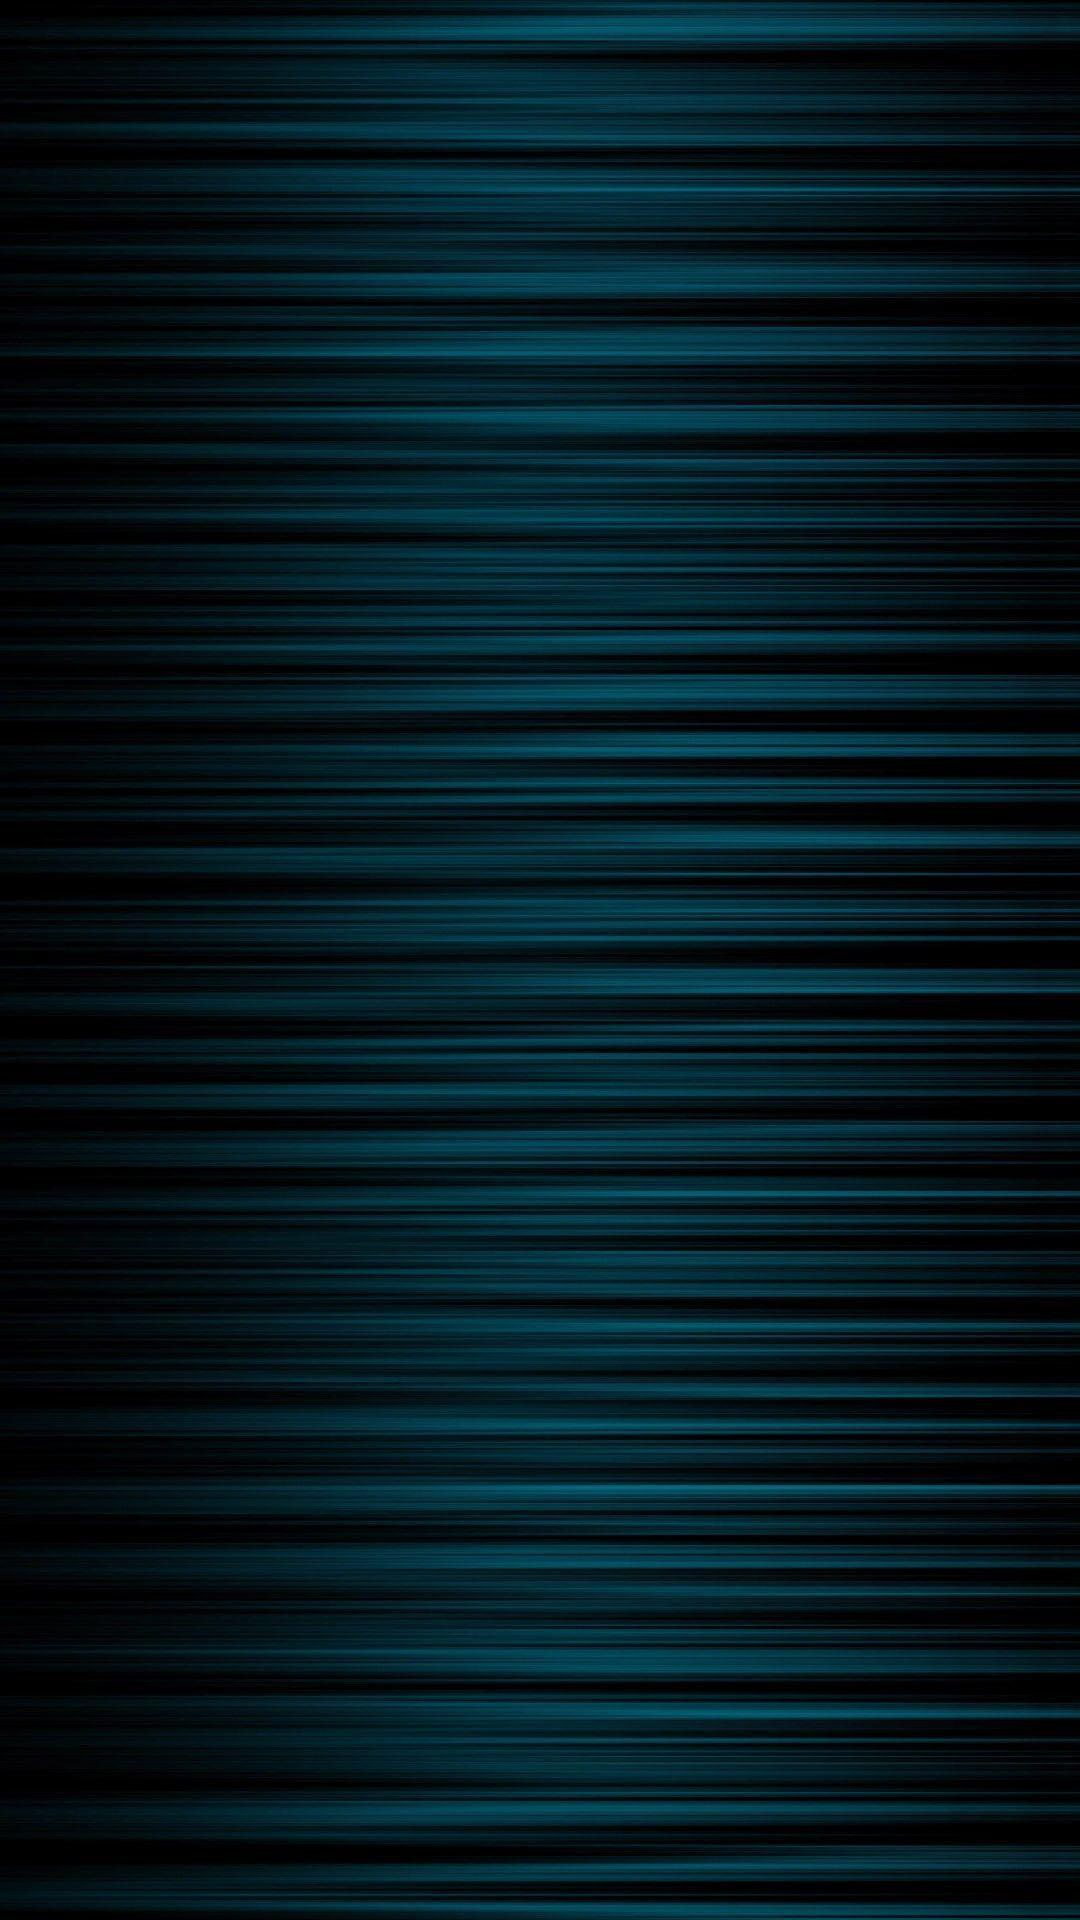 Blue Black Line Pattern Teal Wallpaper Iphone Phone Wallpaper Design Cool Wallpapers For Phones